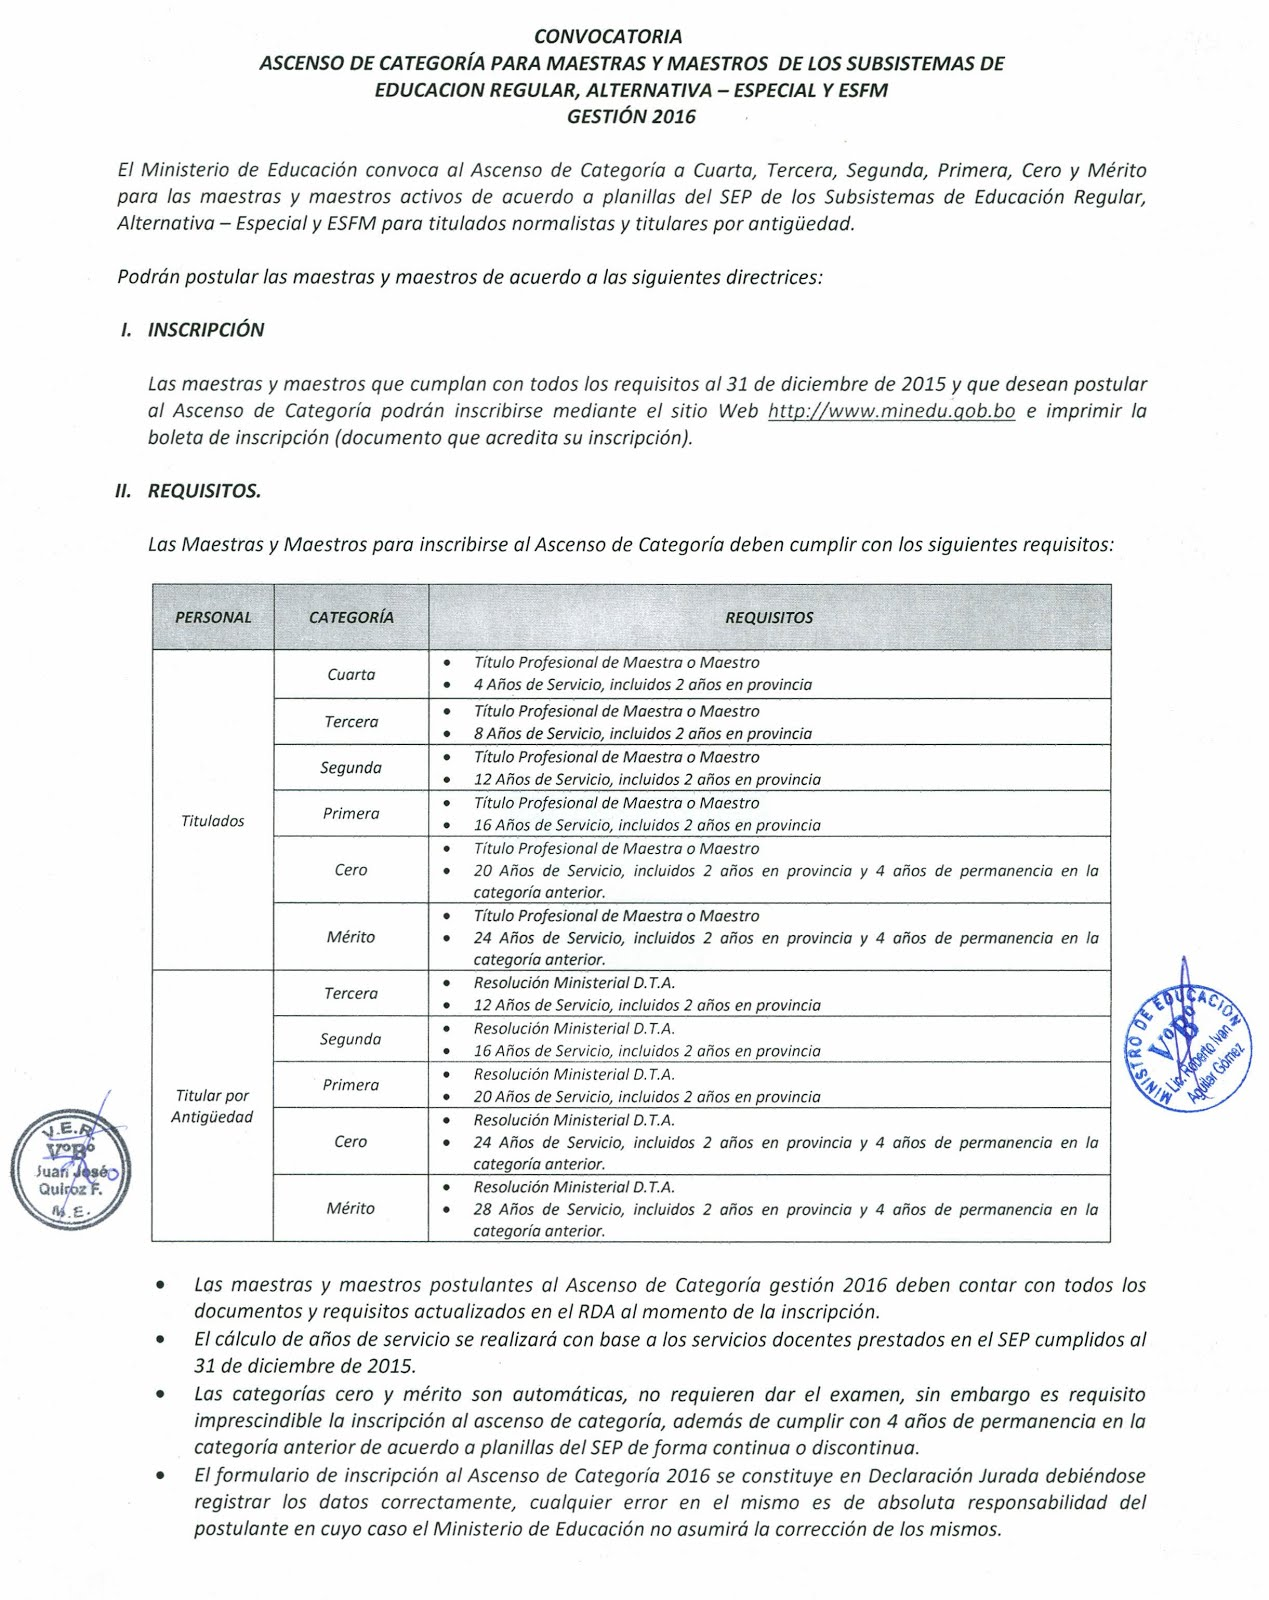 Solo profes de primaria bolivia convocatoria ascenso de for Convocatoria maestros 2016